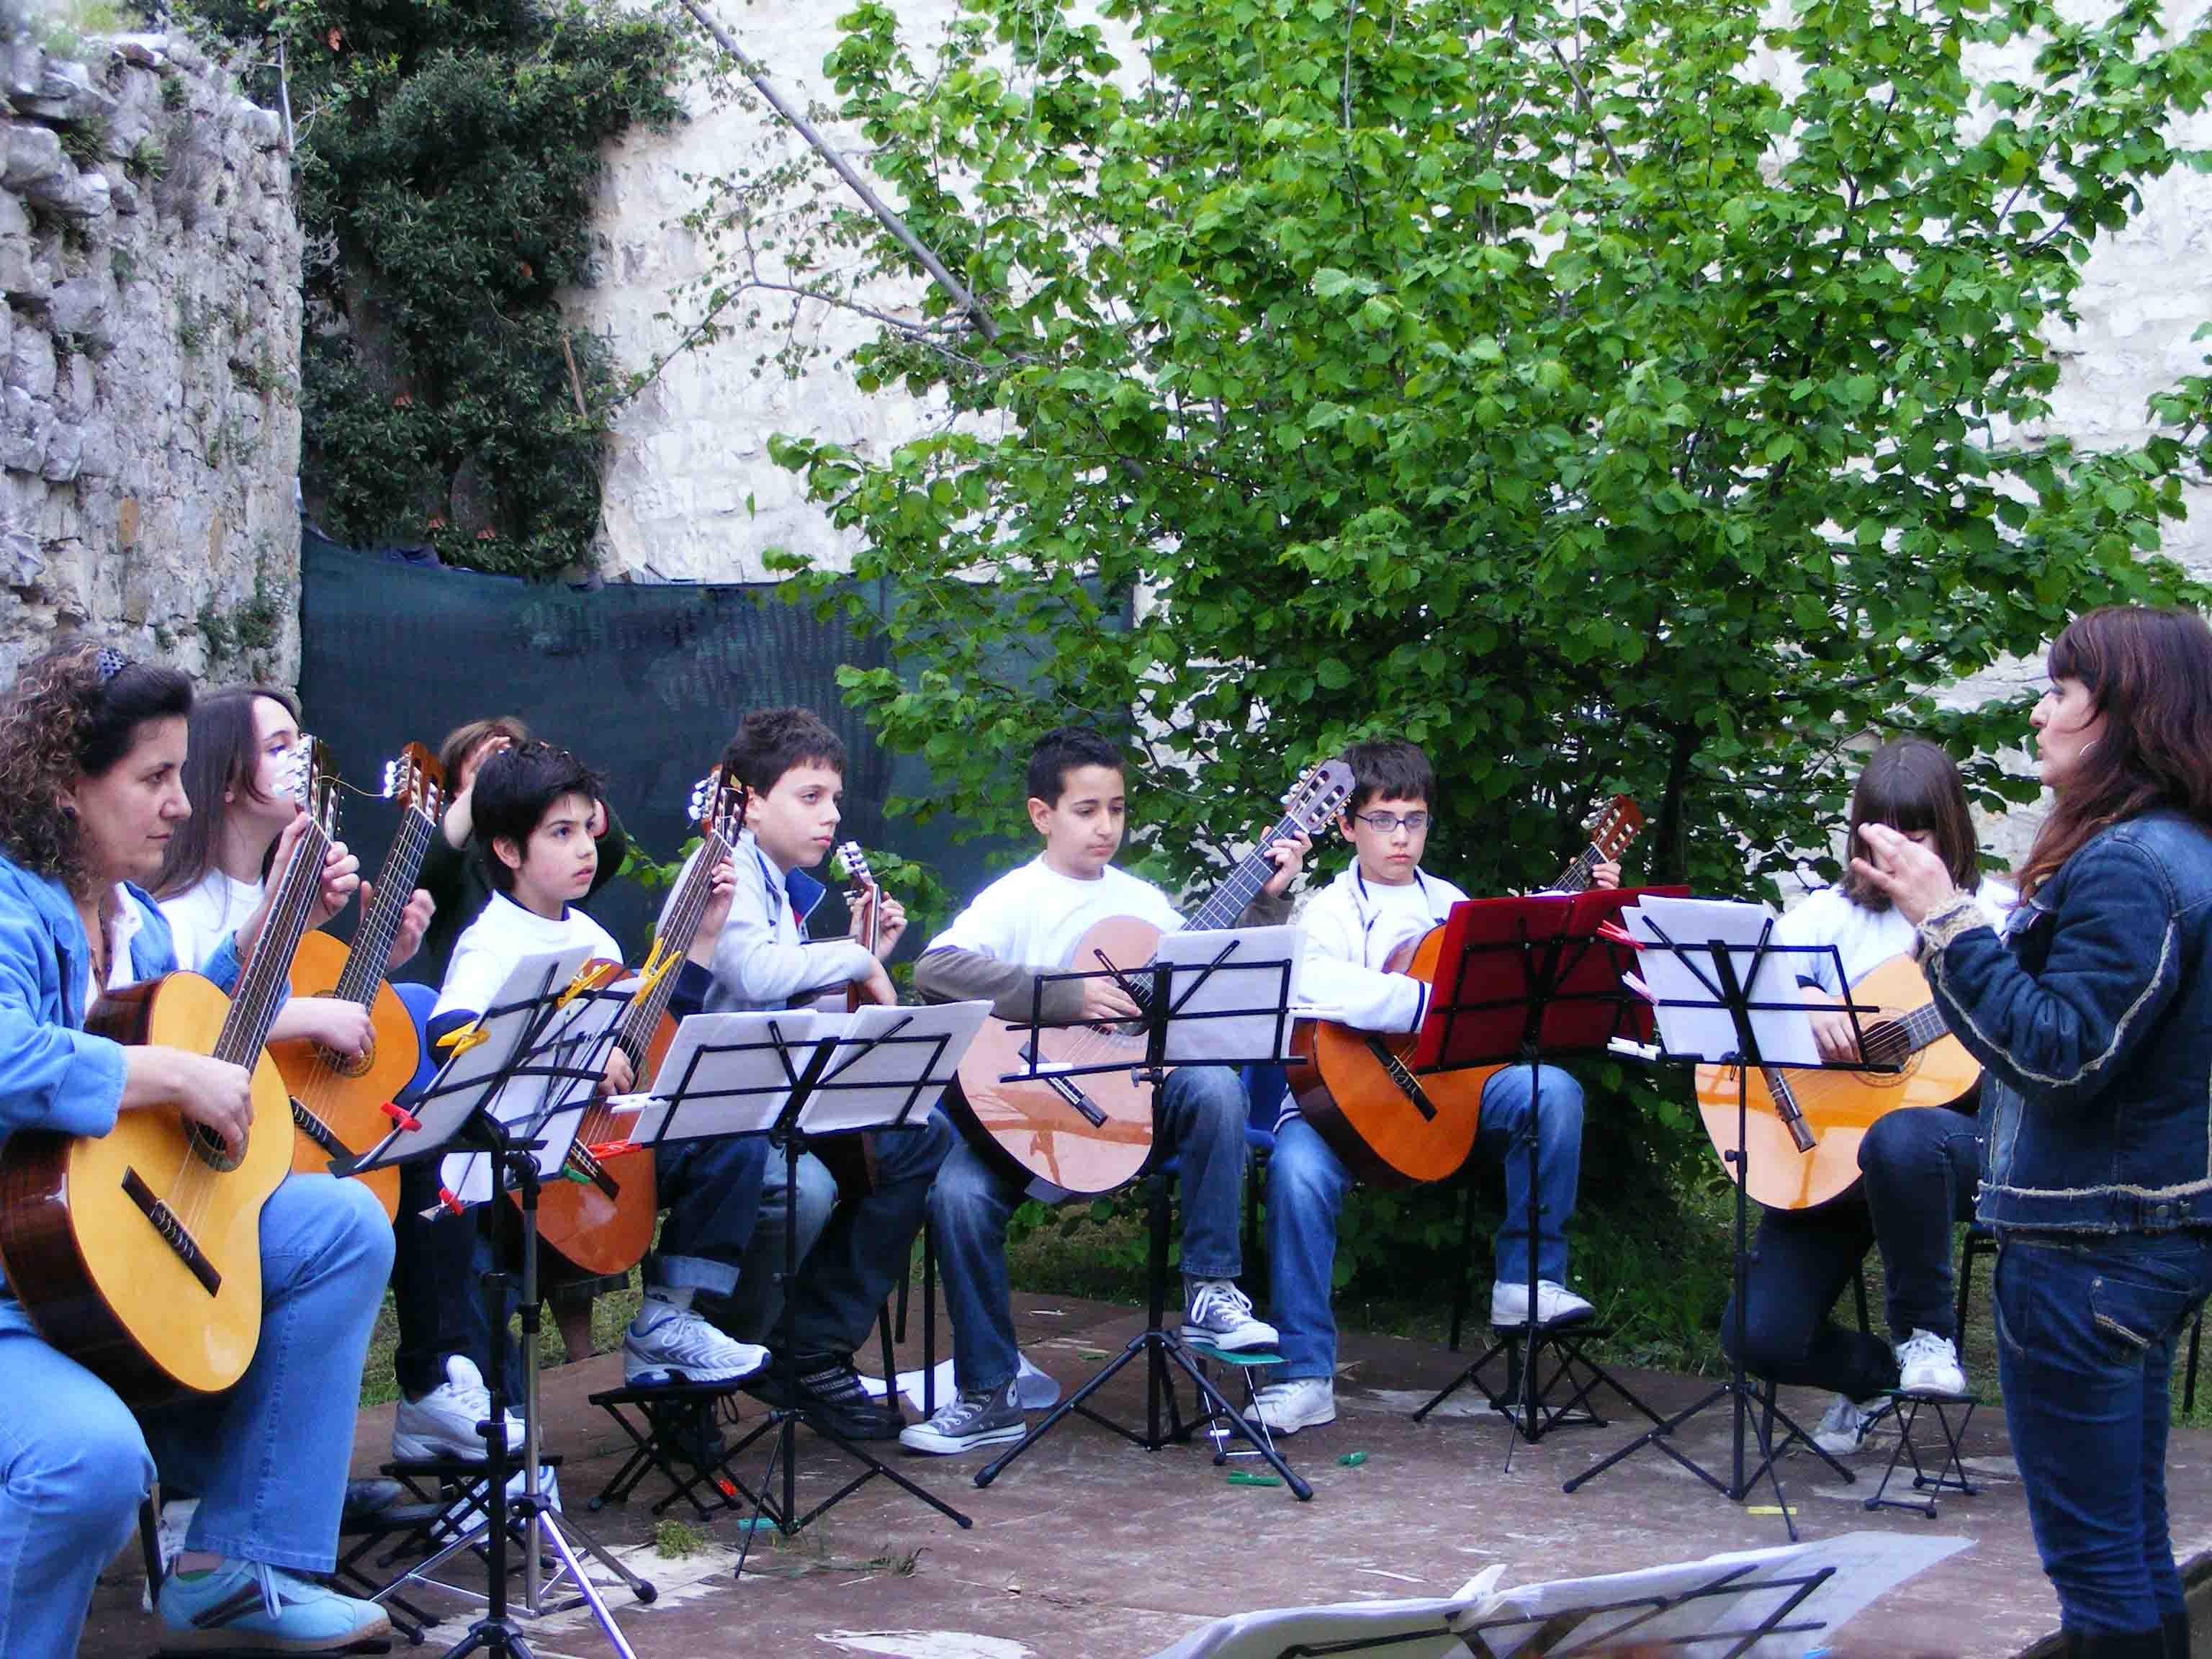 1524729976504612 304008walkabout scuola di music guitar ensemble 050